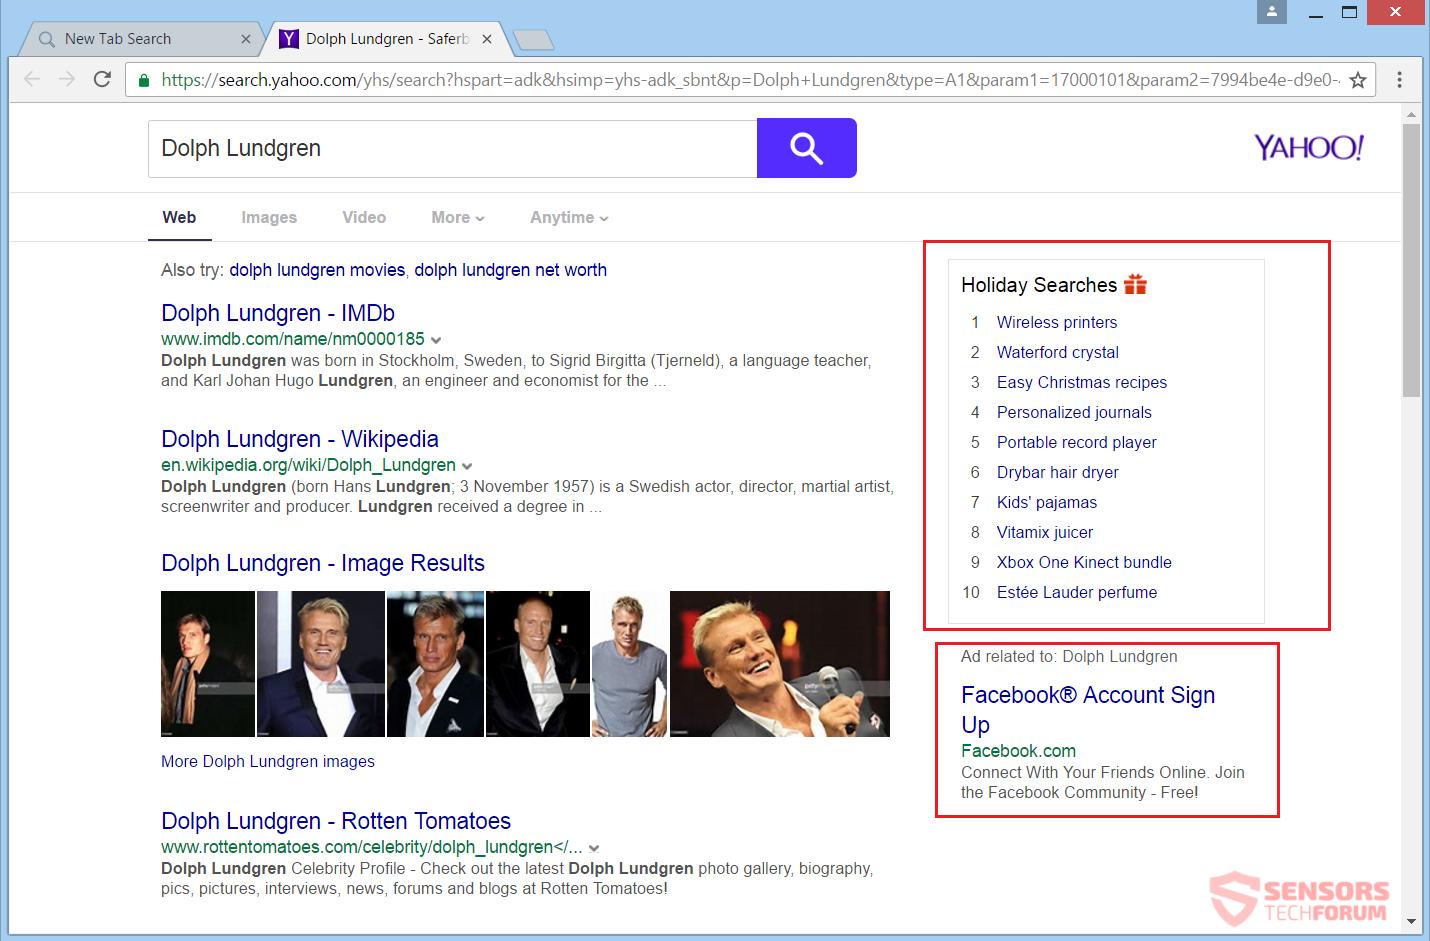 stf-search-memethat-co-meme-that-browser-hijacker-redirect-dolph-lundgren-search-results